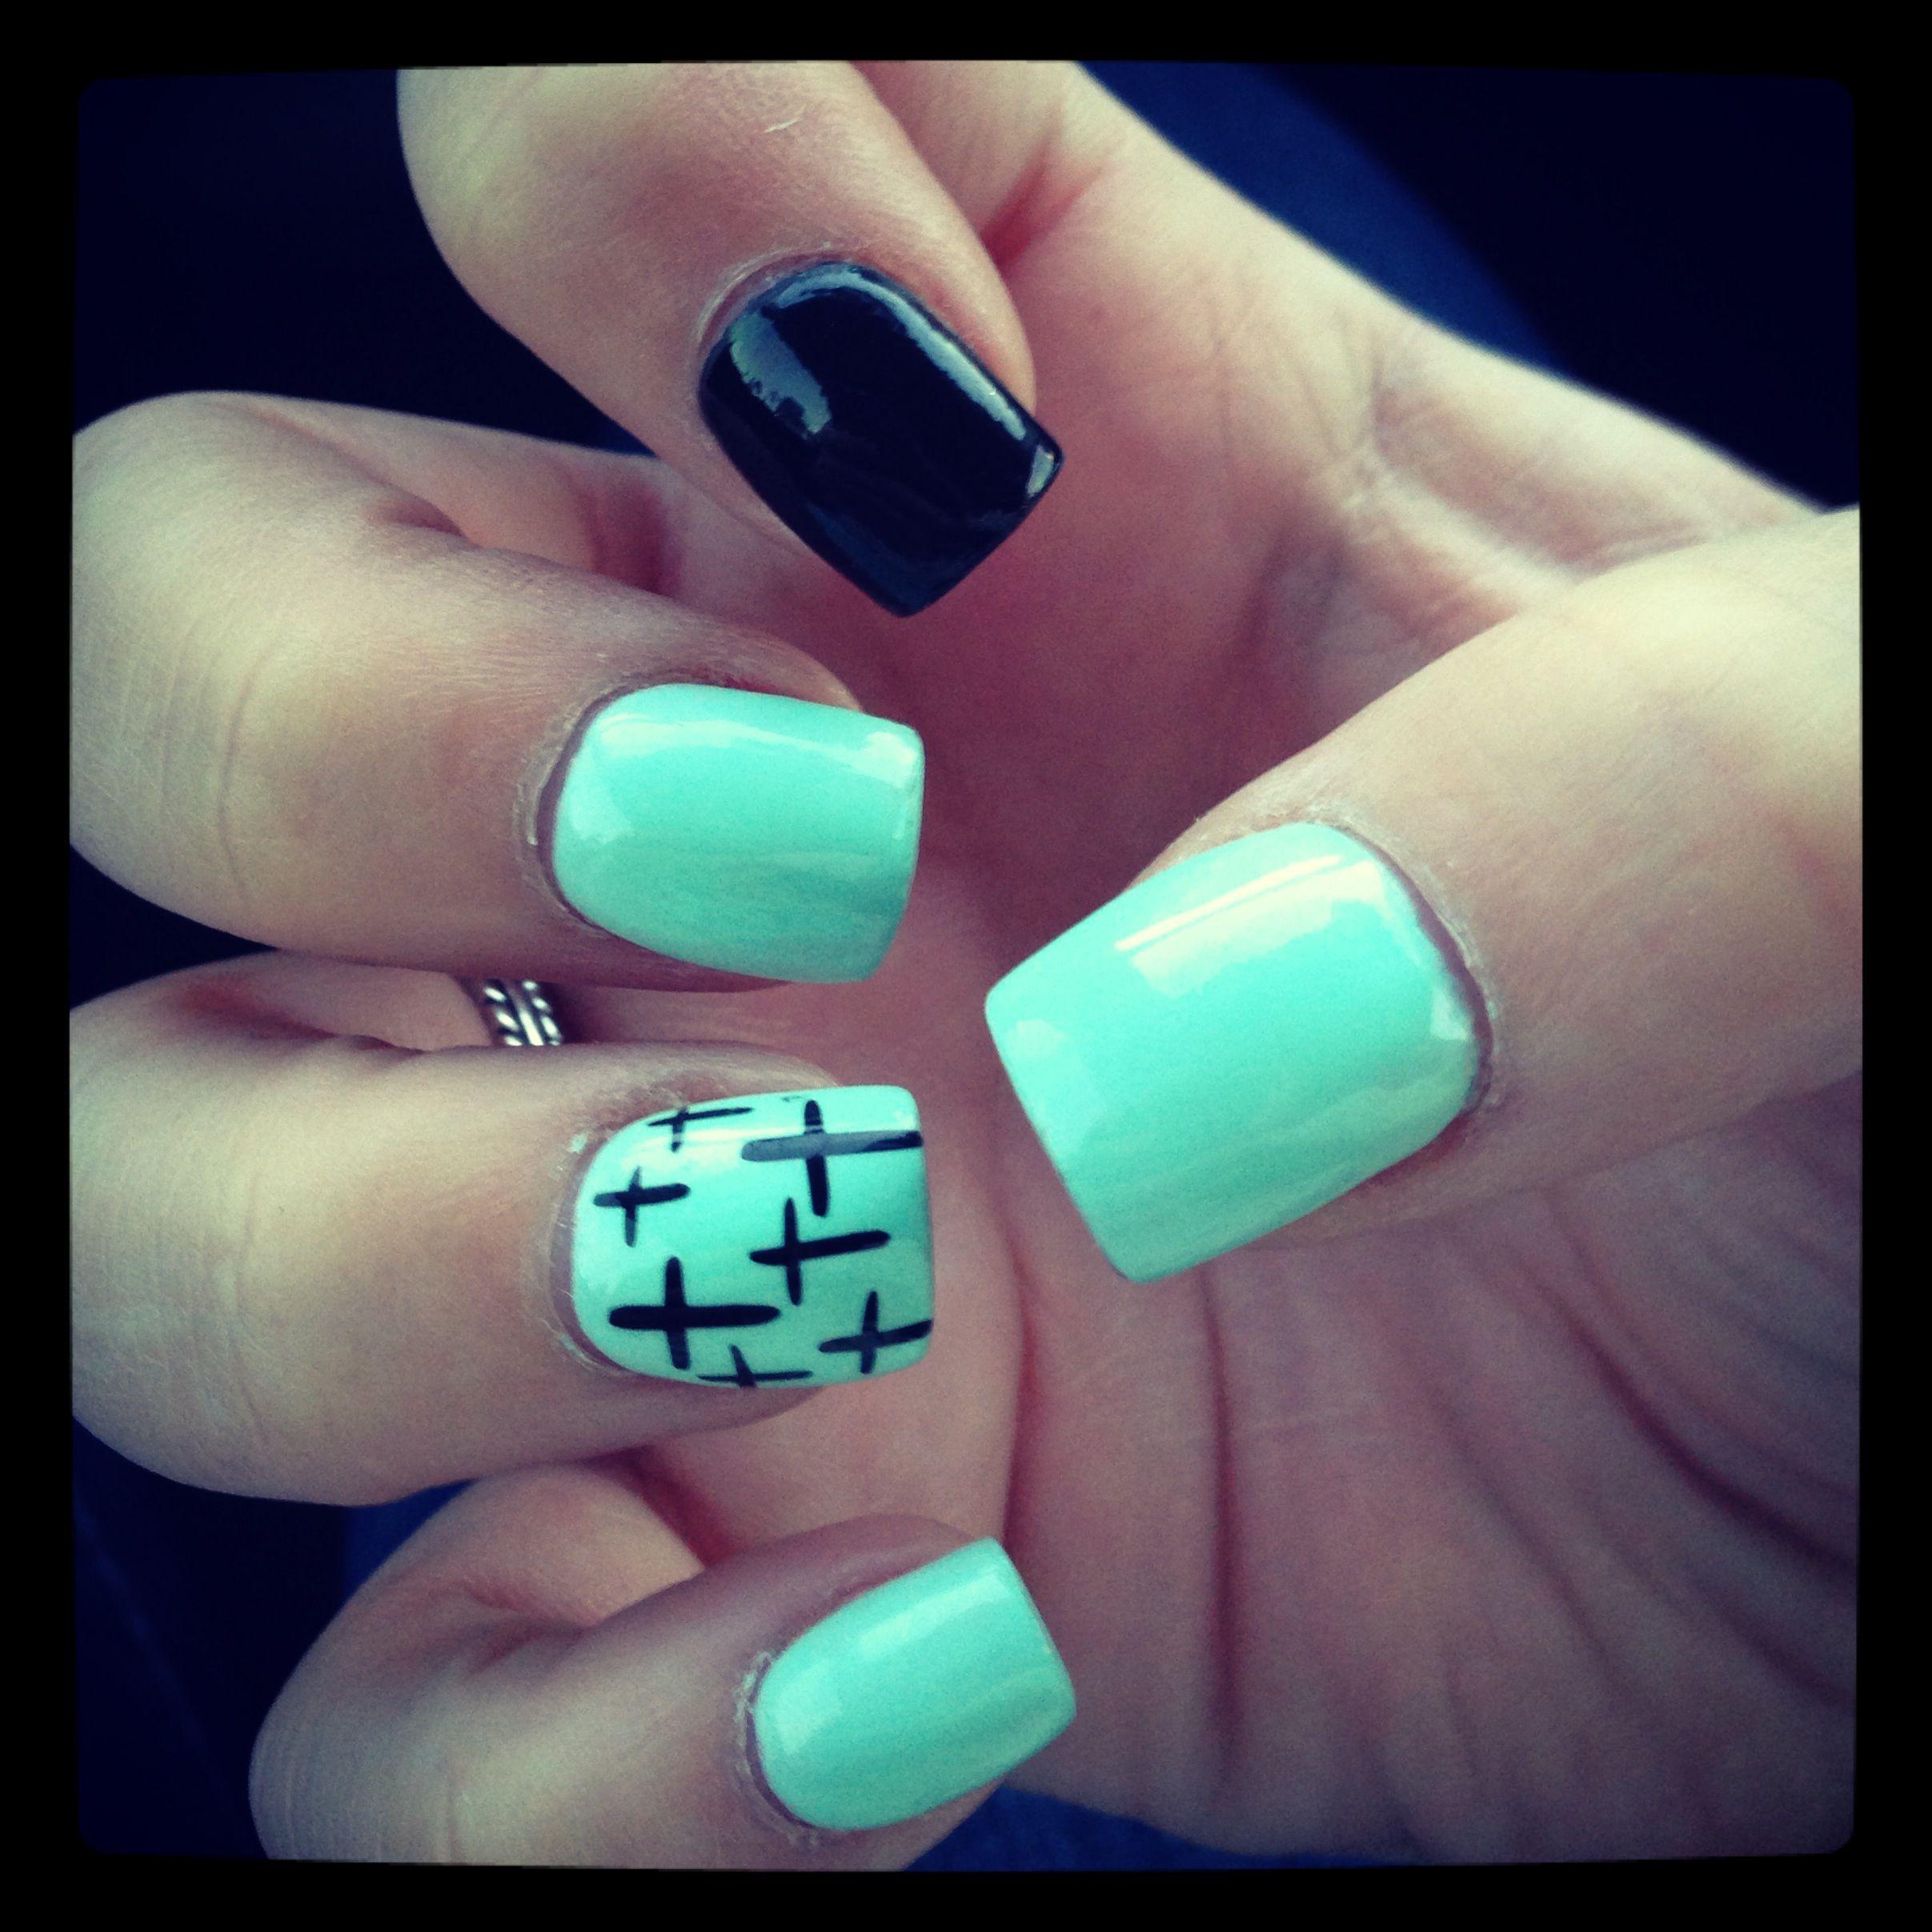 I Love My Nails Mint Nails Crosses Easy Nail Art